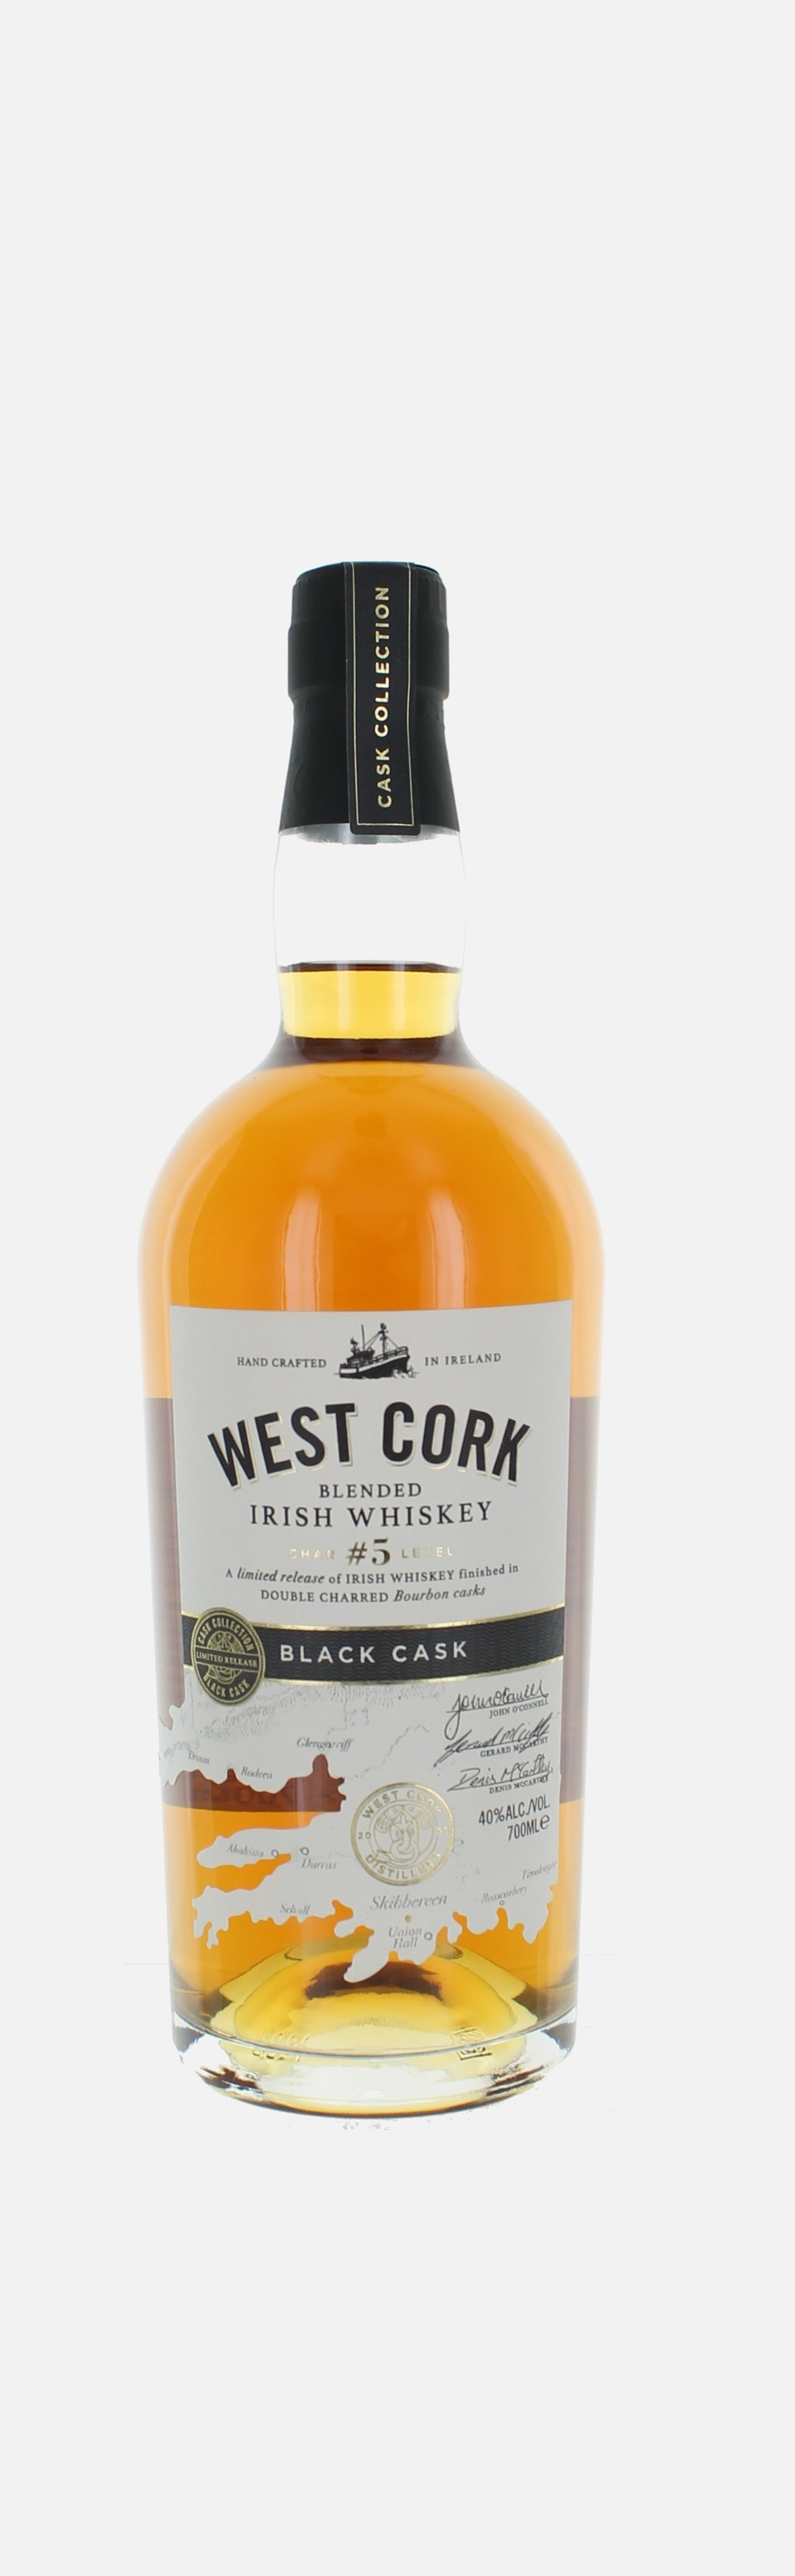 West Cork Black cask, Blended Irish Whisky